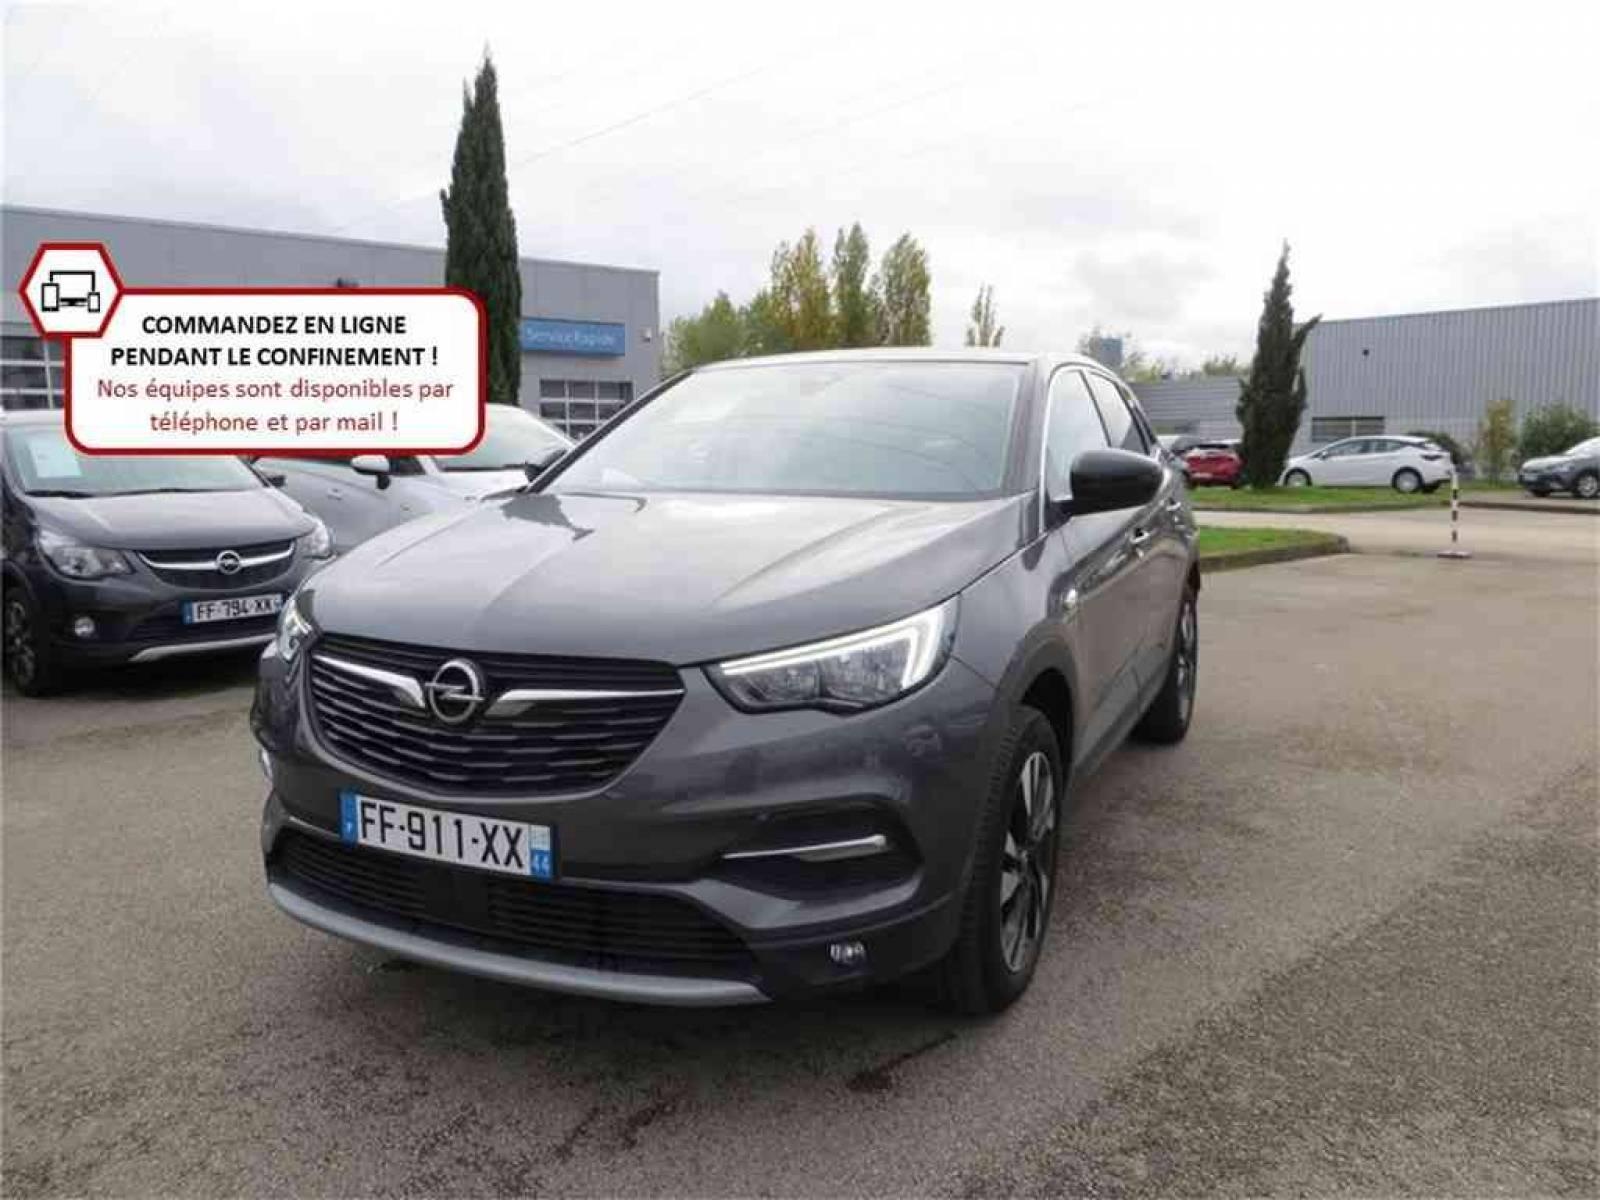 OPEL Grandland X 1.5 Diesel 130 ch BVA6 - véhicule d'occasion - Groupe Guillet - Opel Magicauto - Chalon-sur-Saône - 71380 - Saint-Marcel - 1